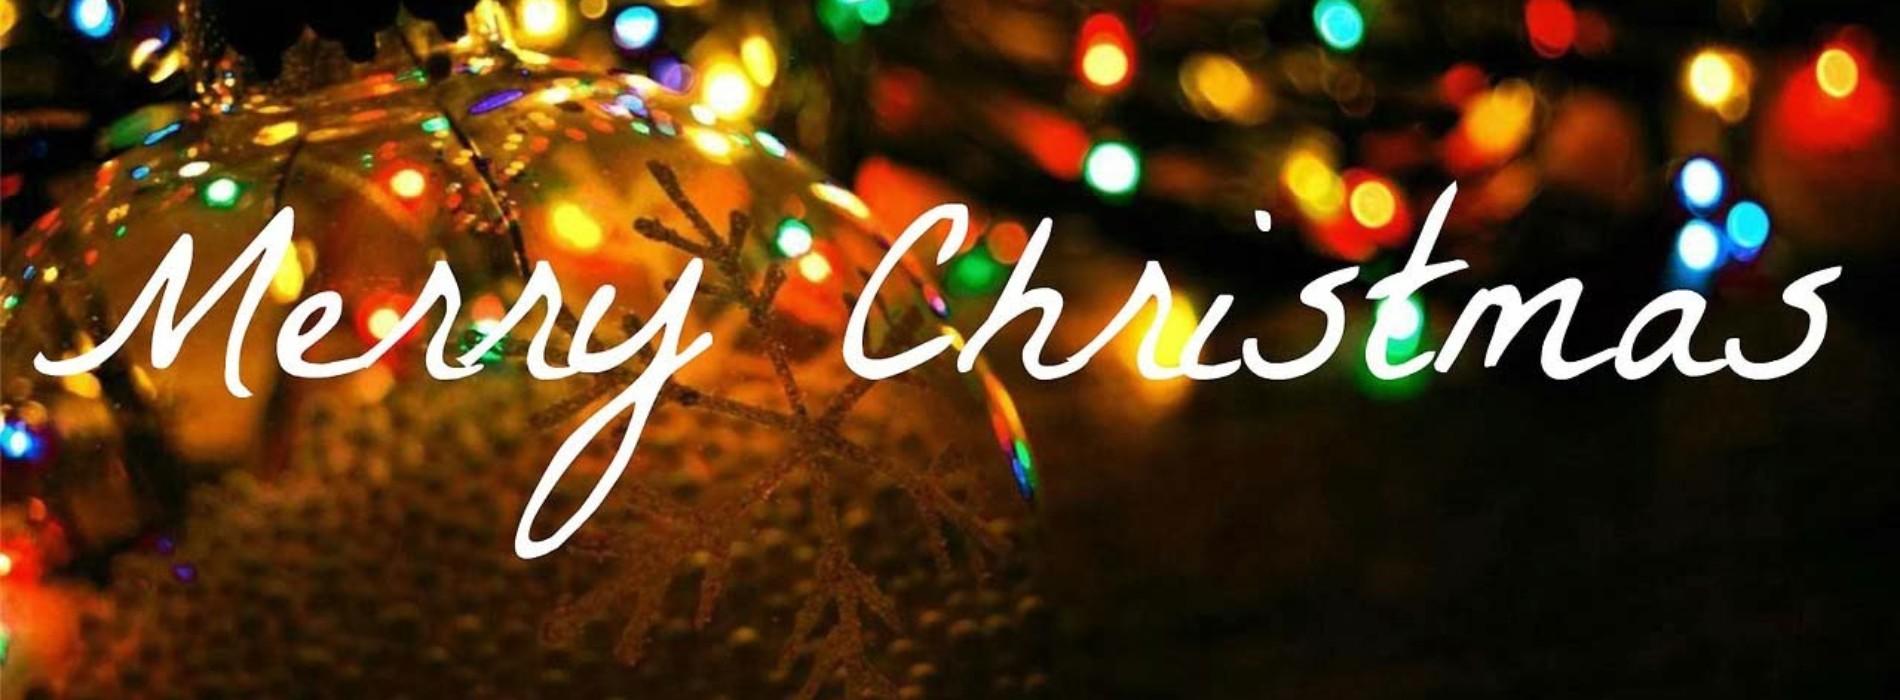 Merry Christmas From Us @ DecibelLk